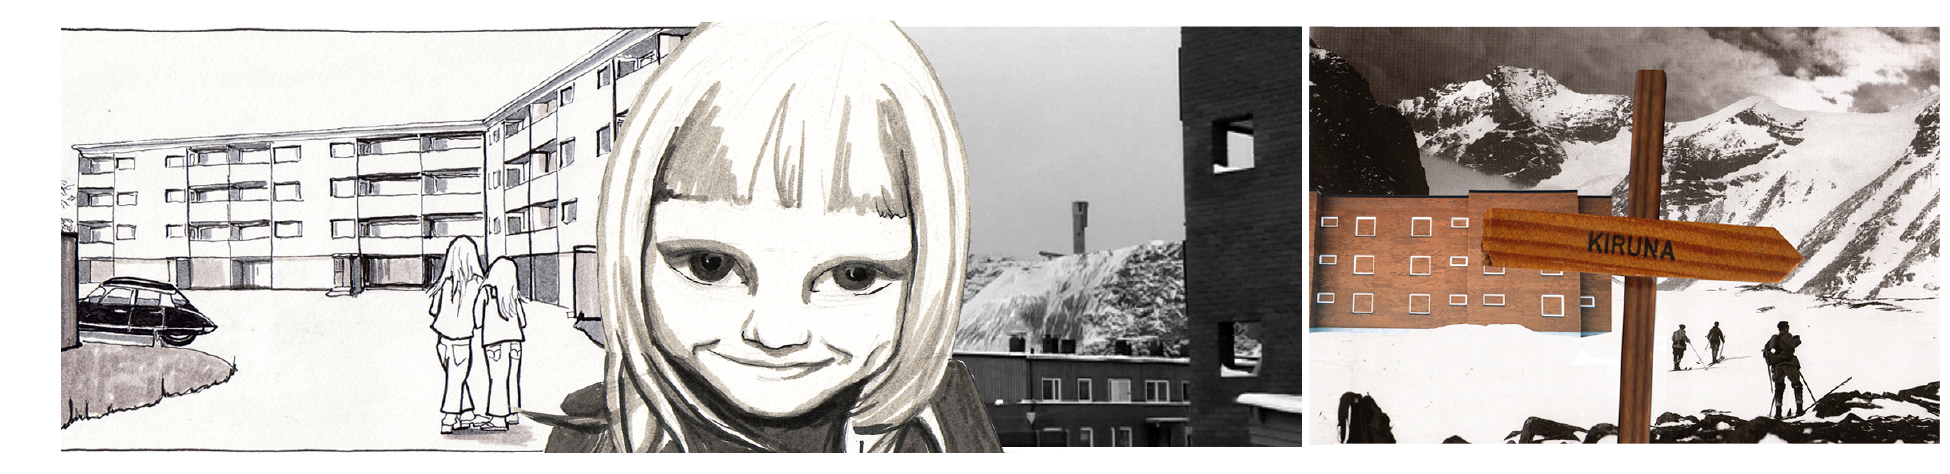 Kiruna collage